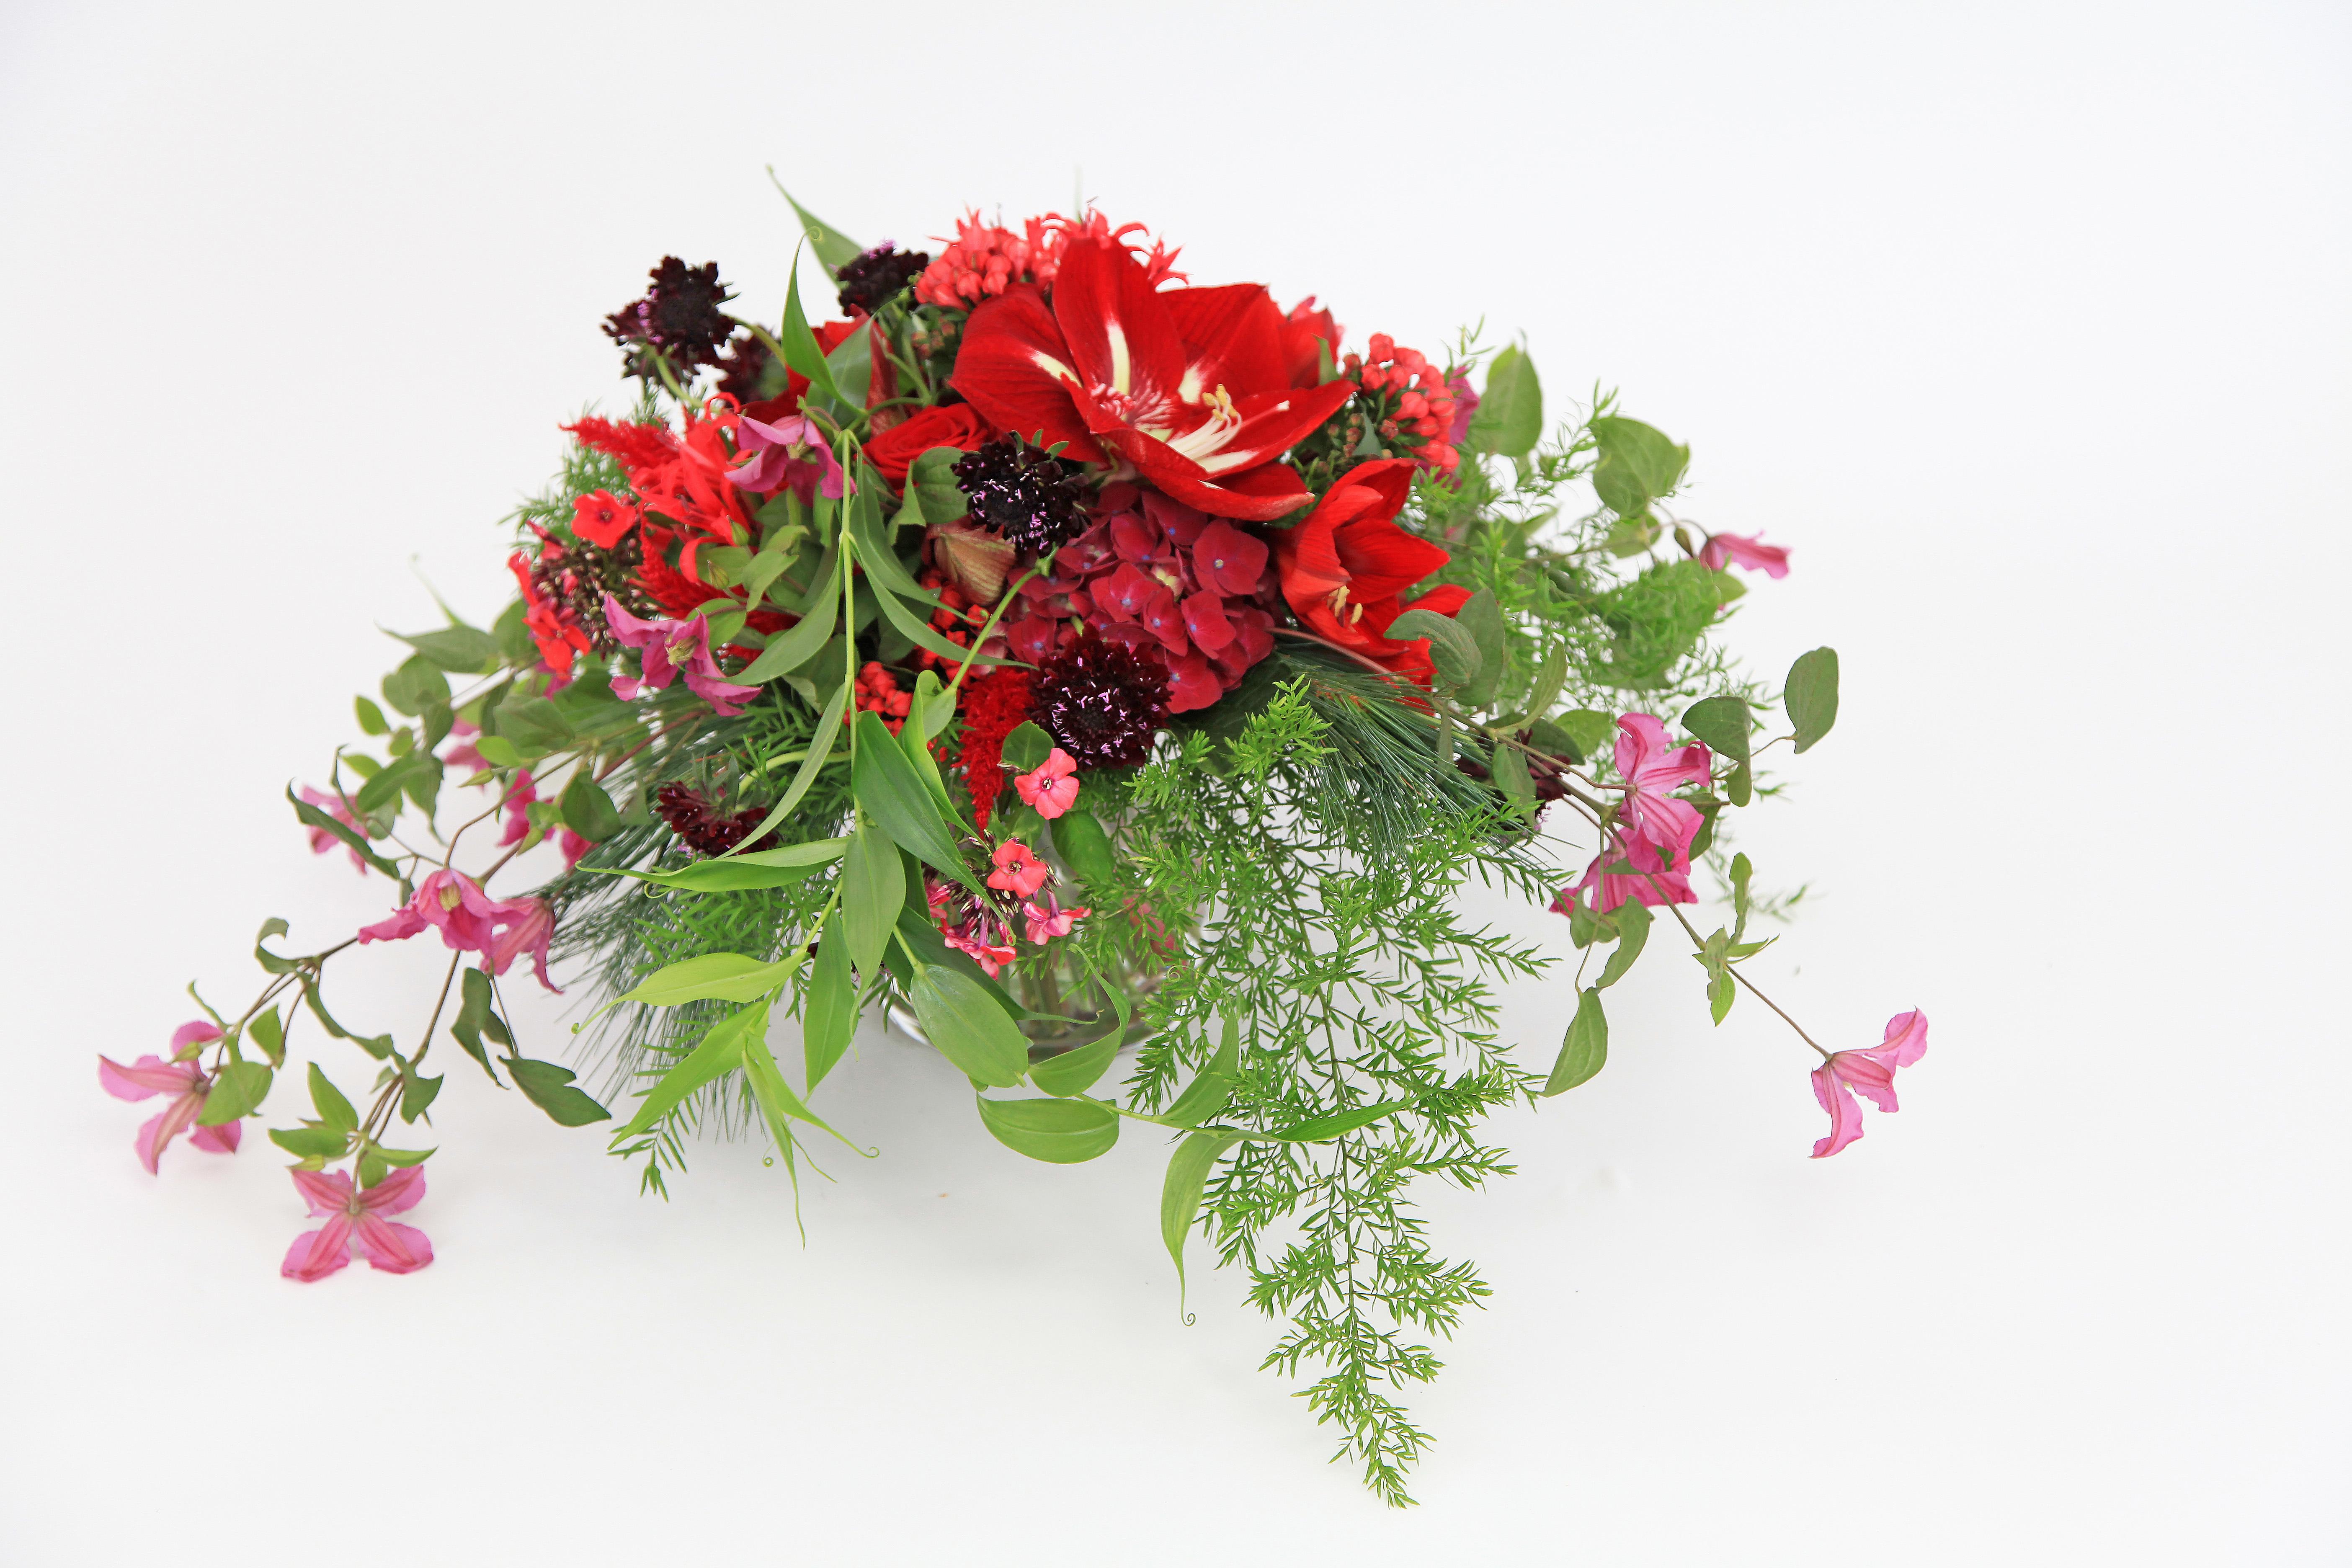 porta nova stein hansen floral fundamentals